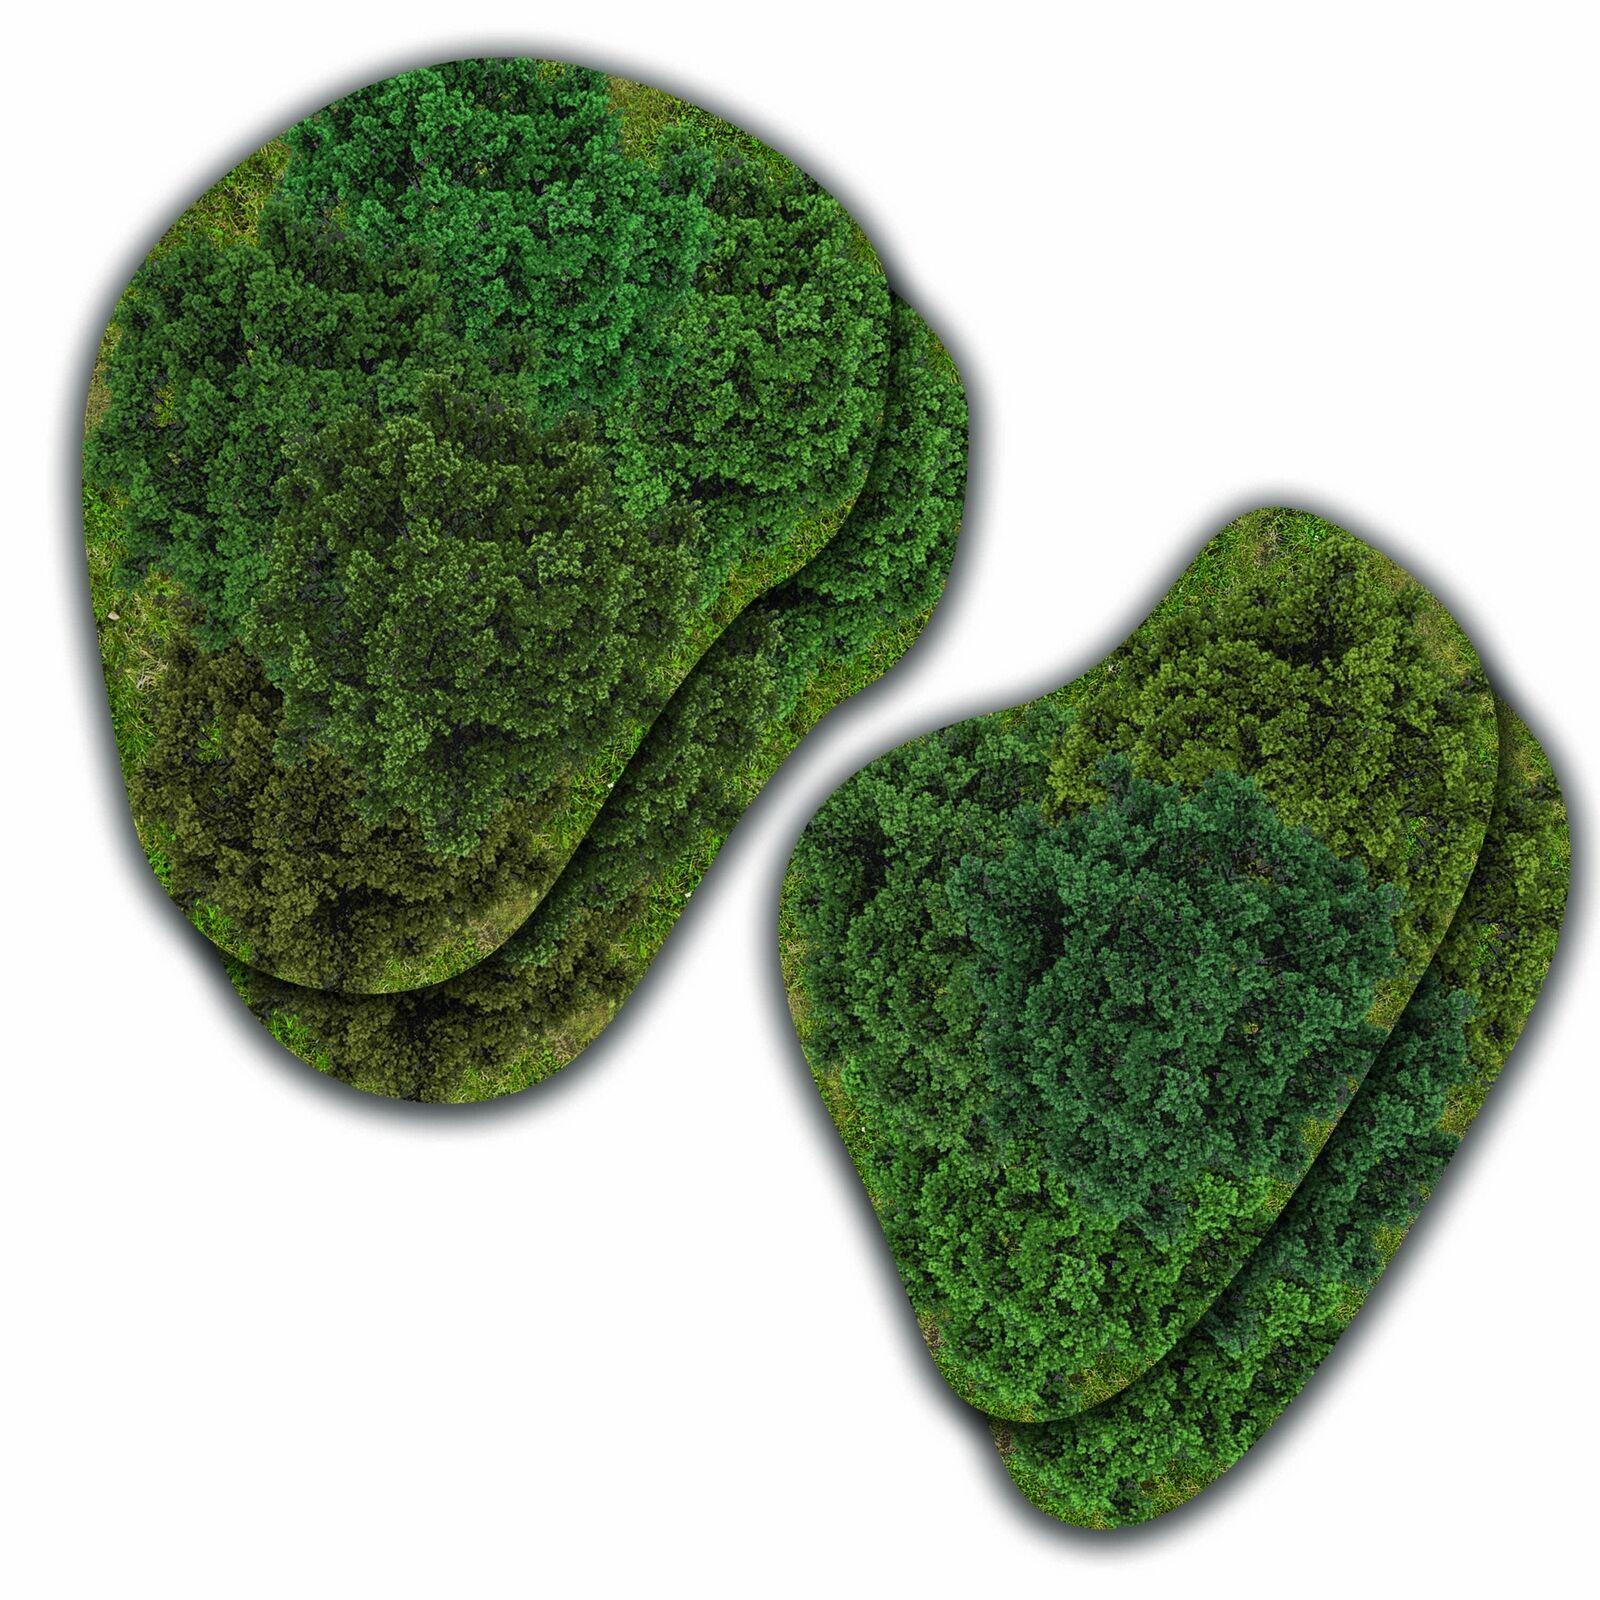 ältere stil  hiddenforest wälder 2d - terrain (mouse pad material)